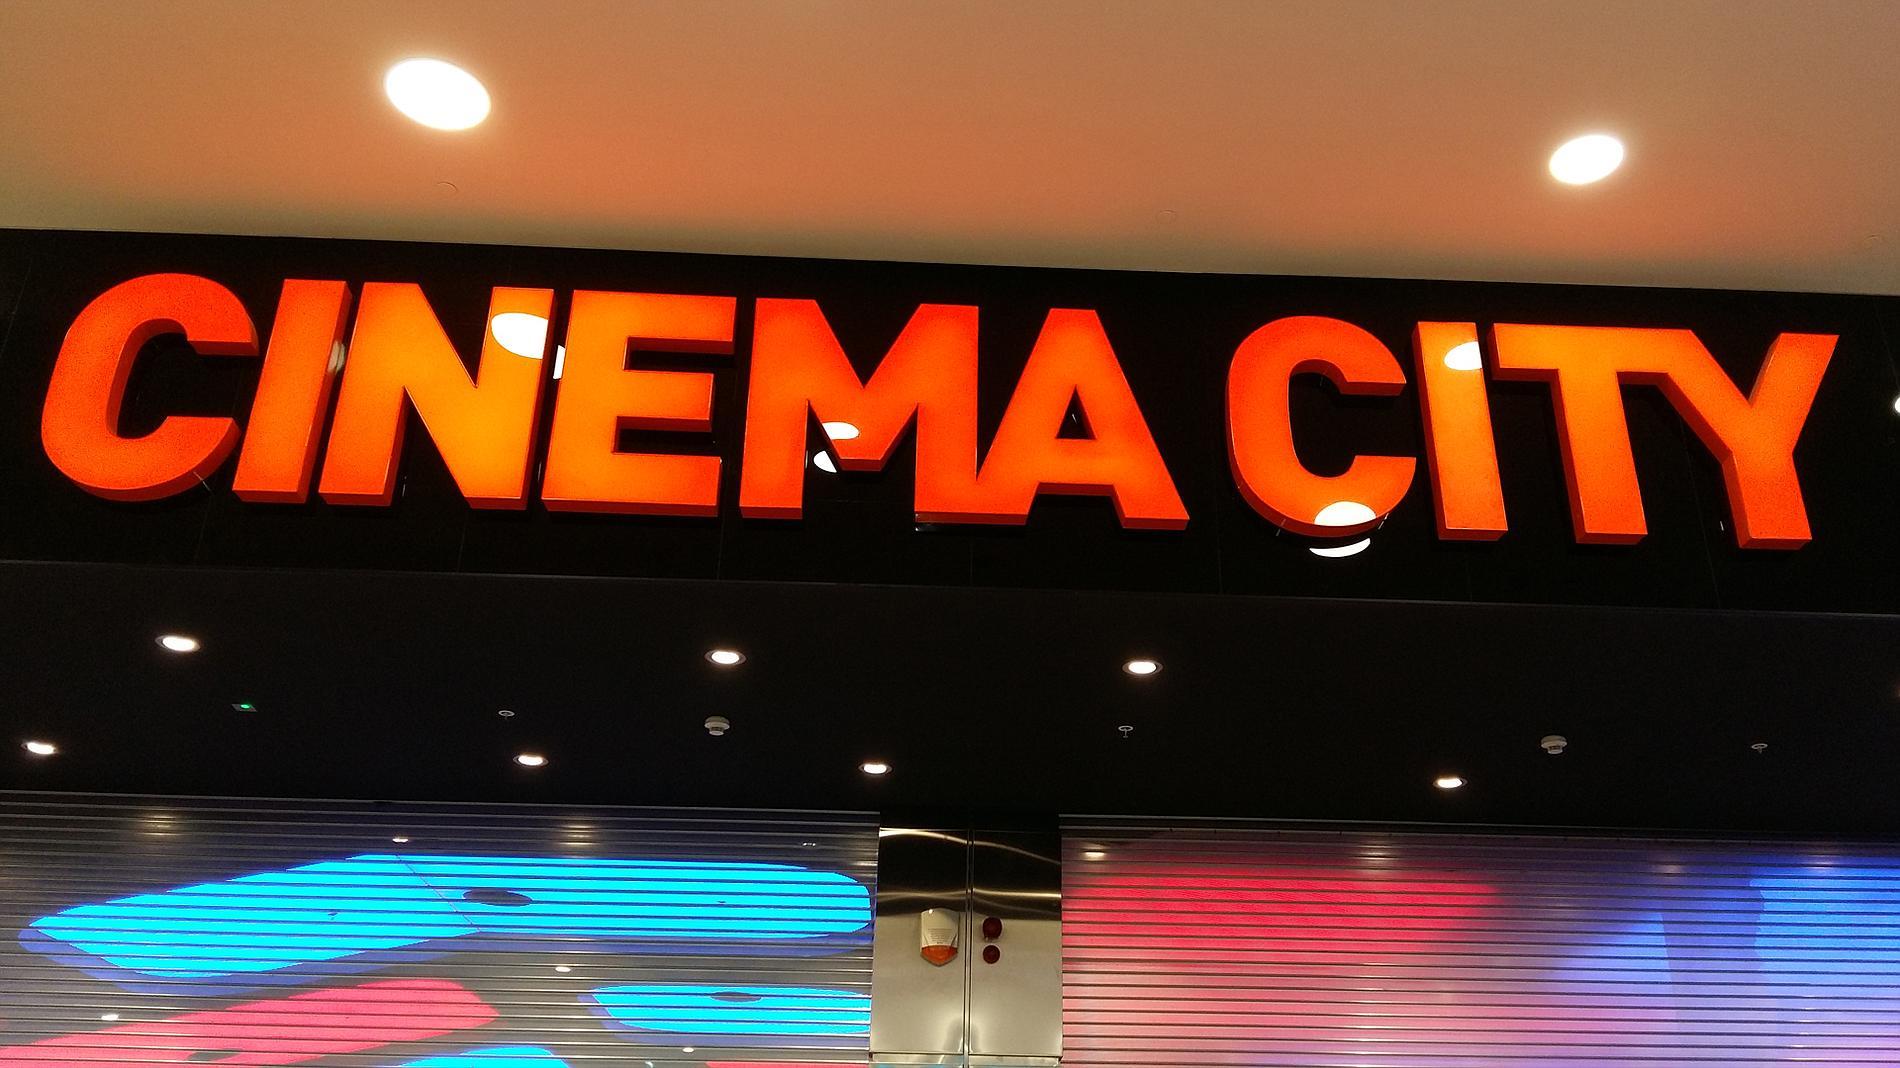 Cinema City illuminated letters